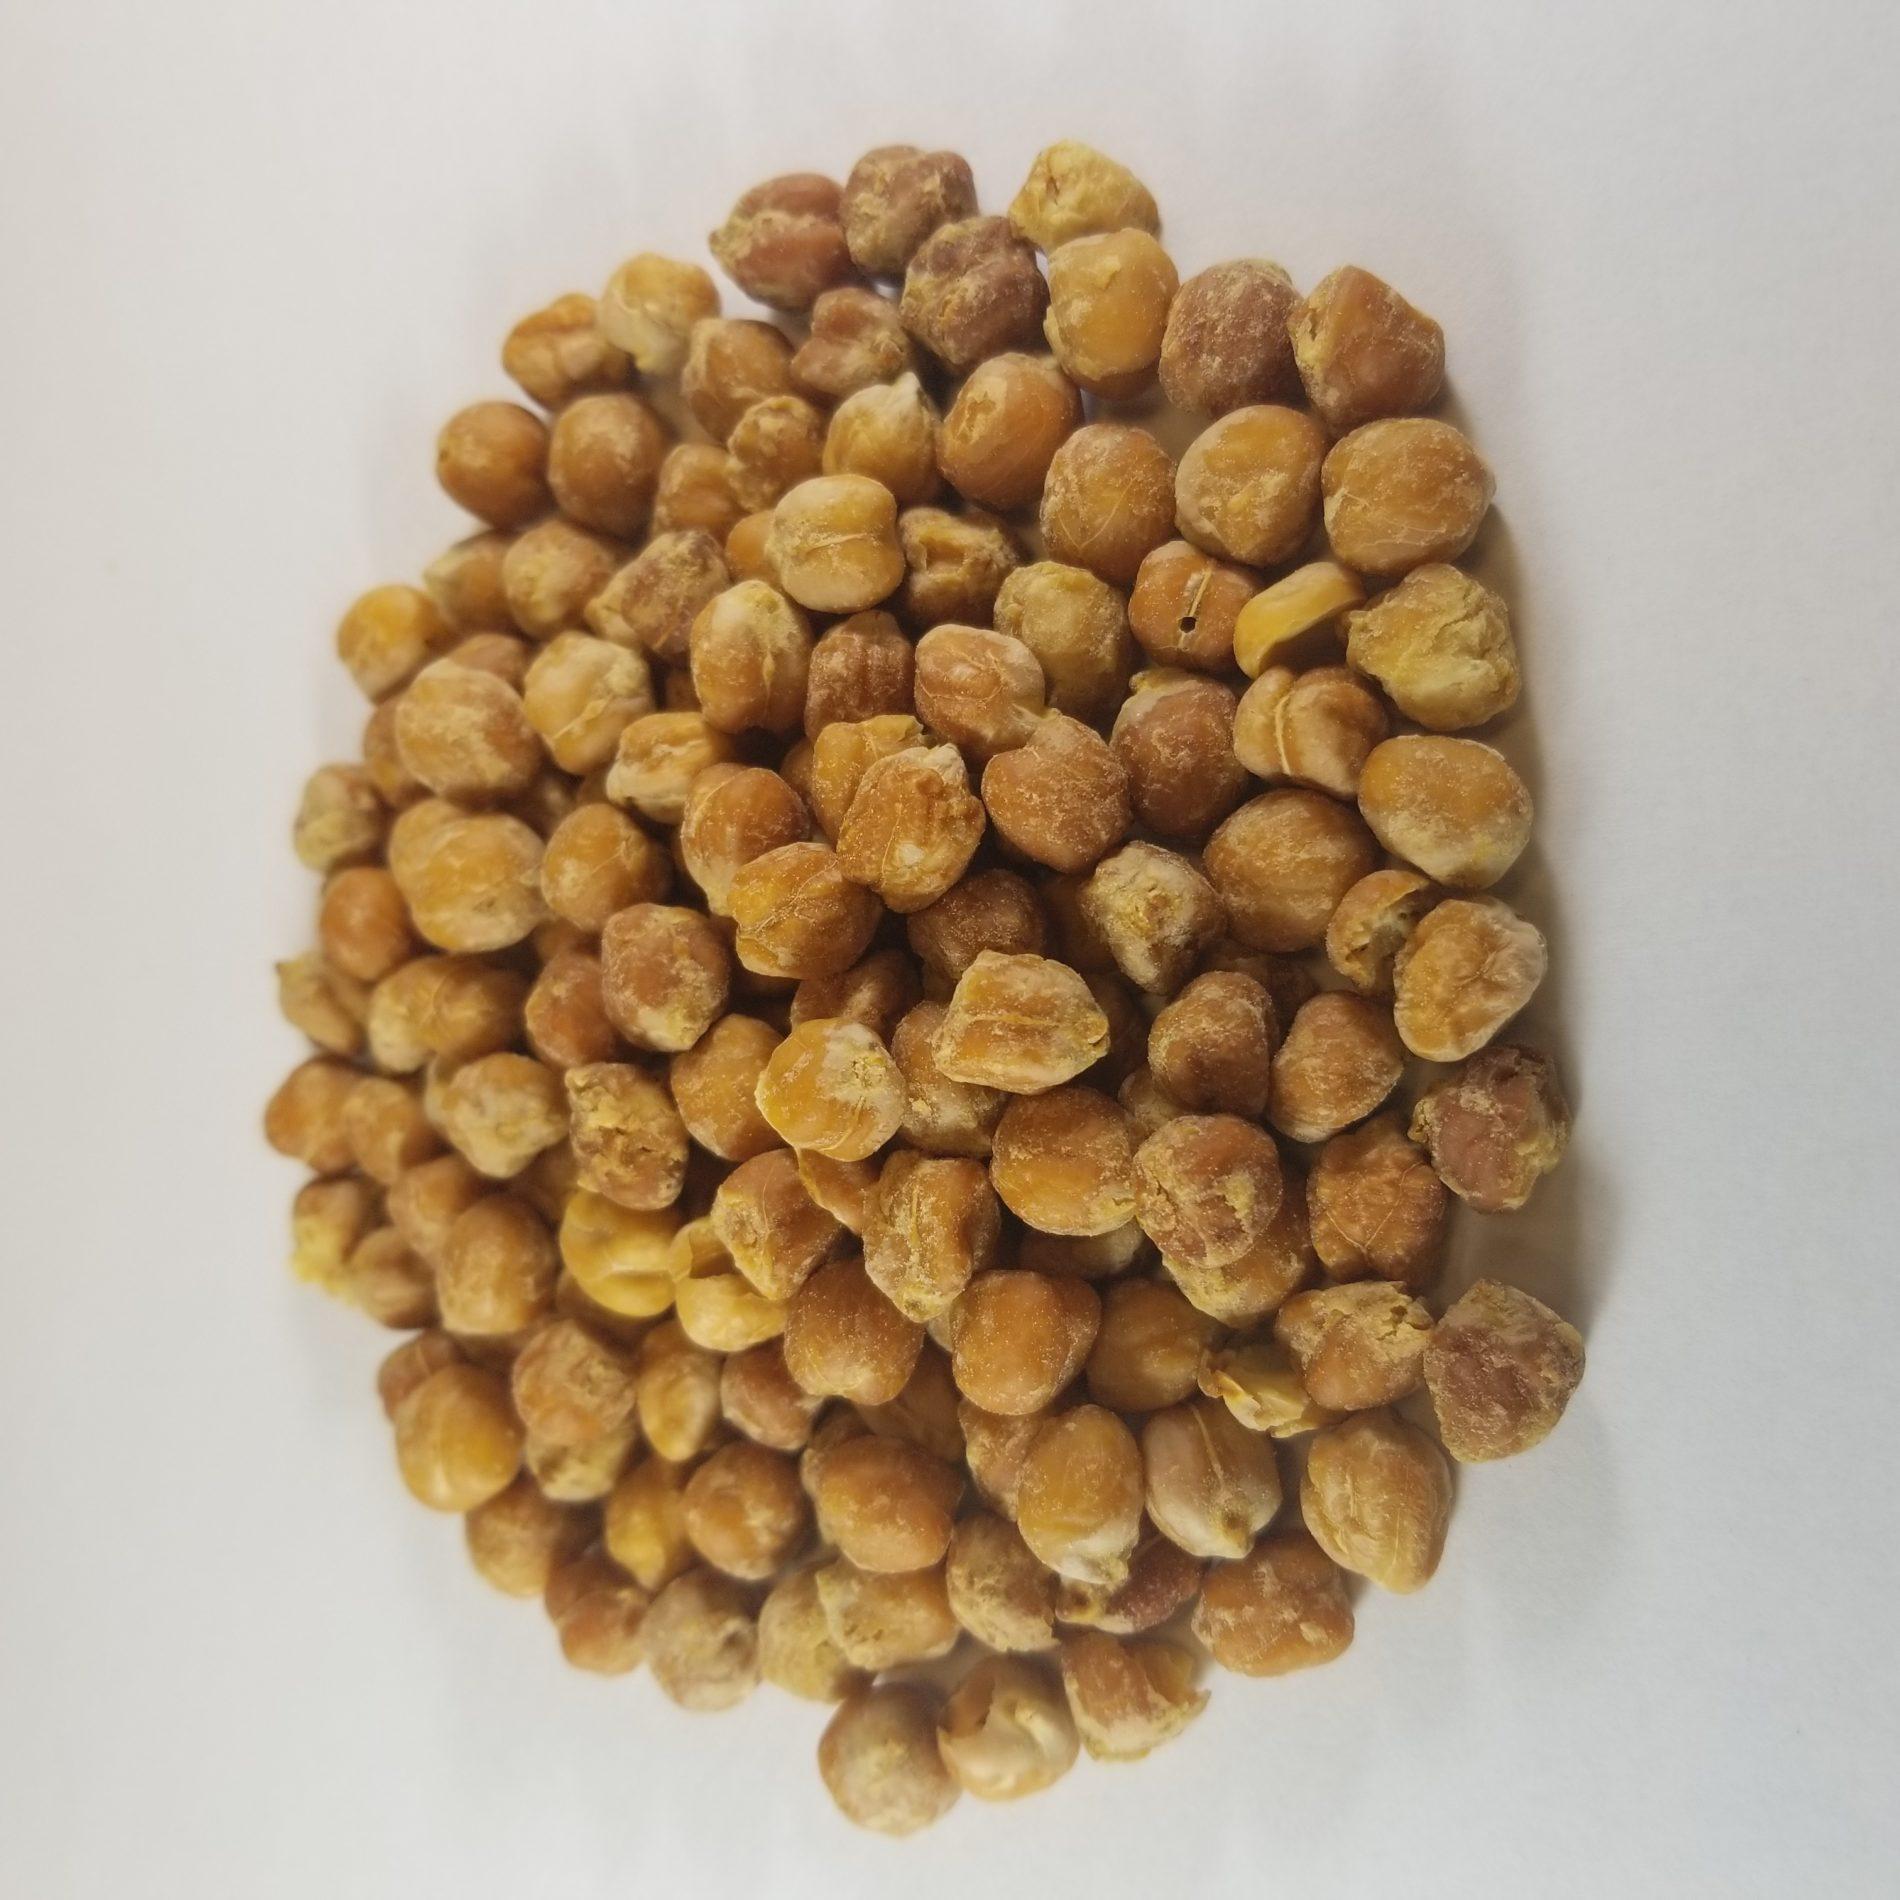 Organic Garbanzo Beans, 50LB Bag/1000LB Tote